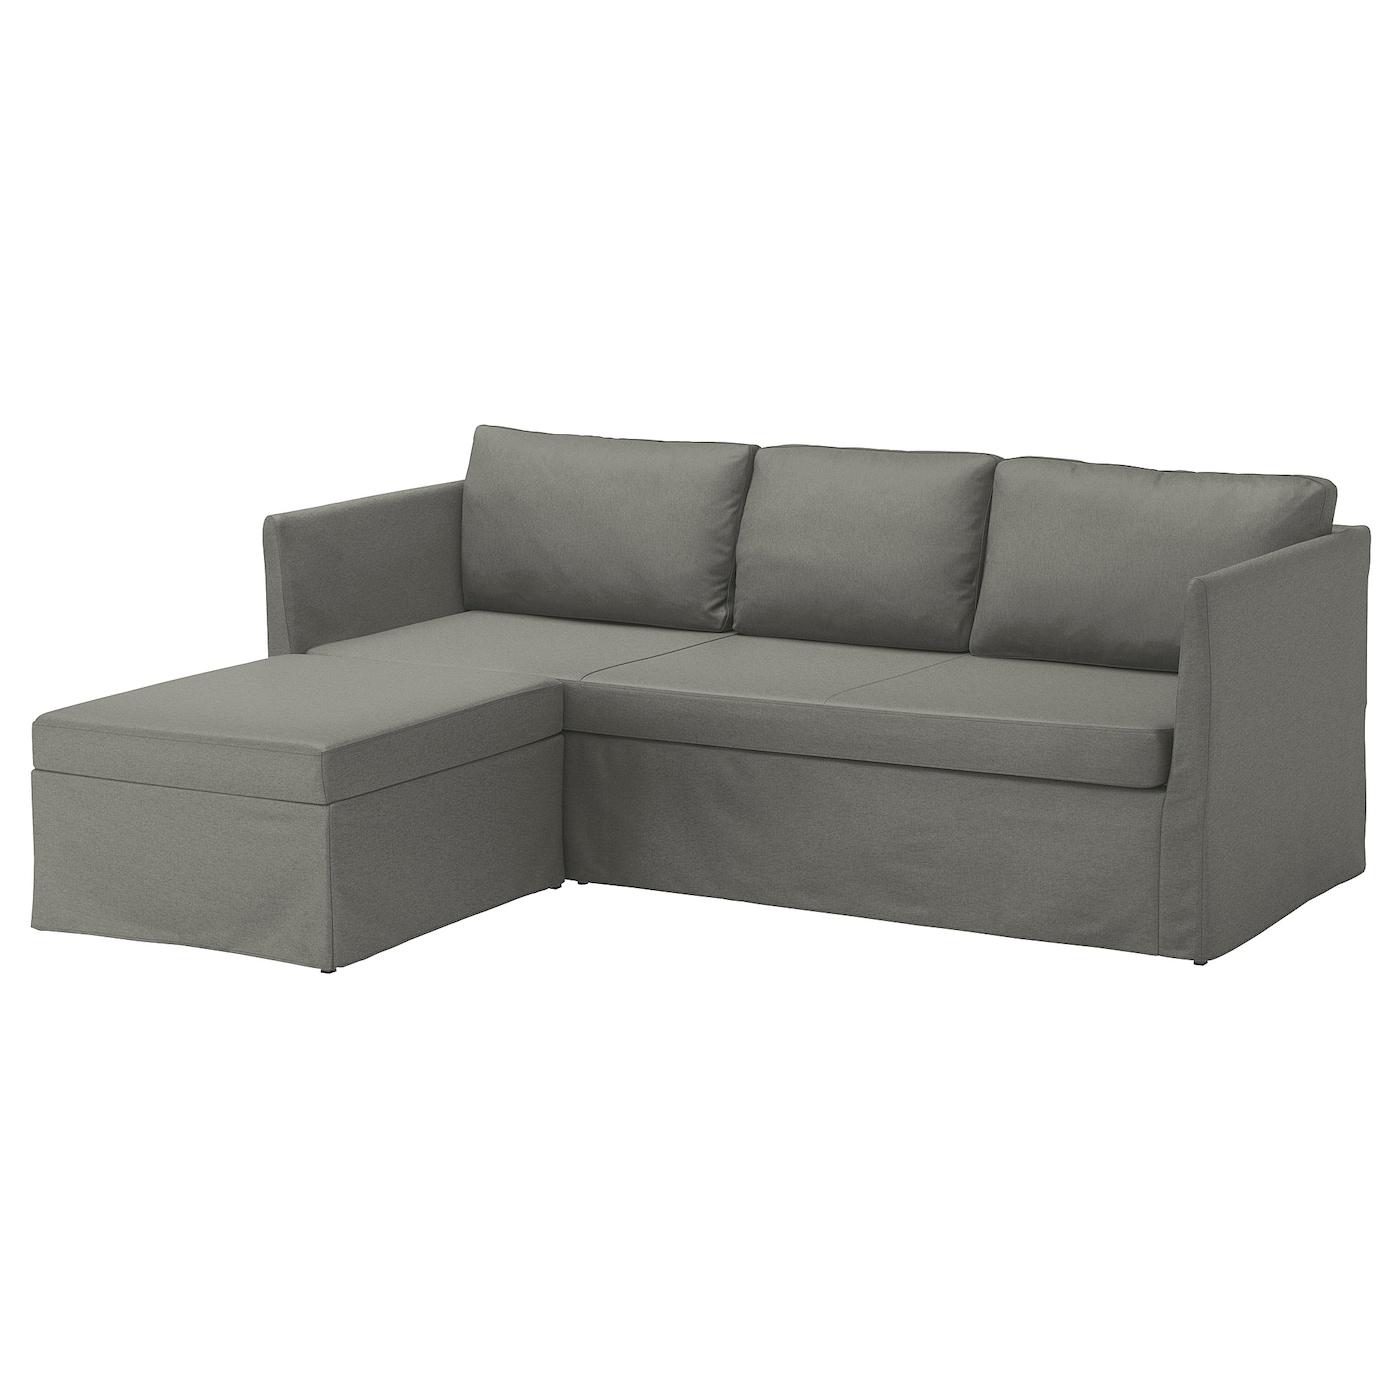 Wondrous Brathult Corner Sofa Bed Borred Grey Green Pabps2019 Chair Design Images Pabps2019Com